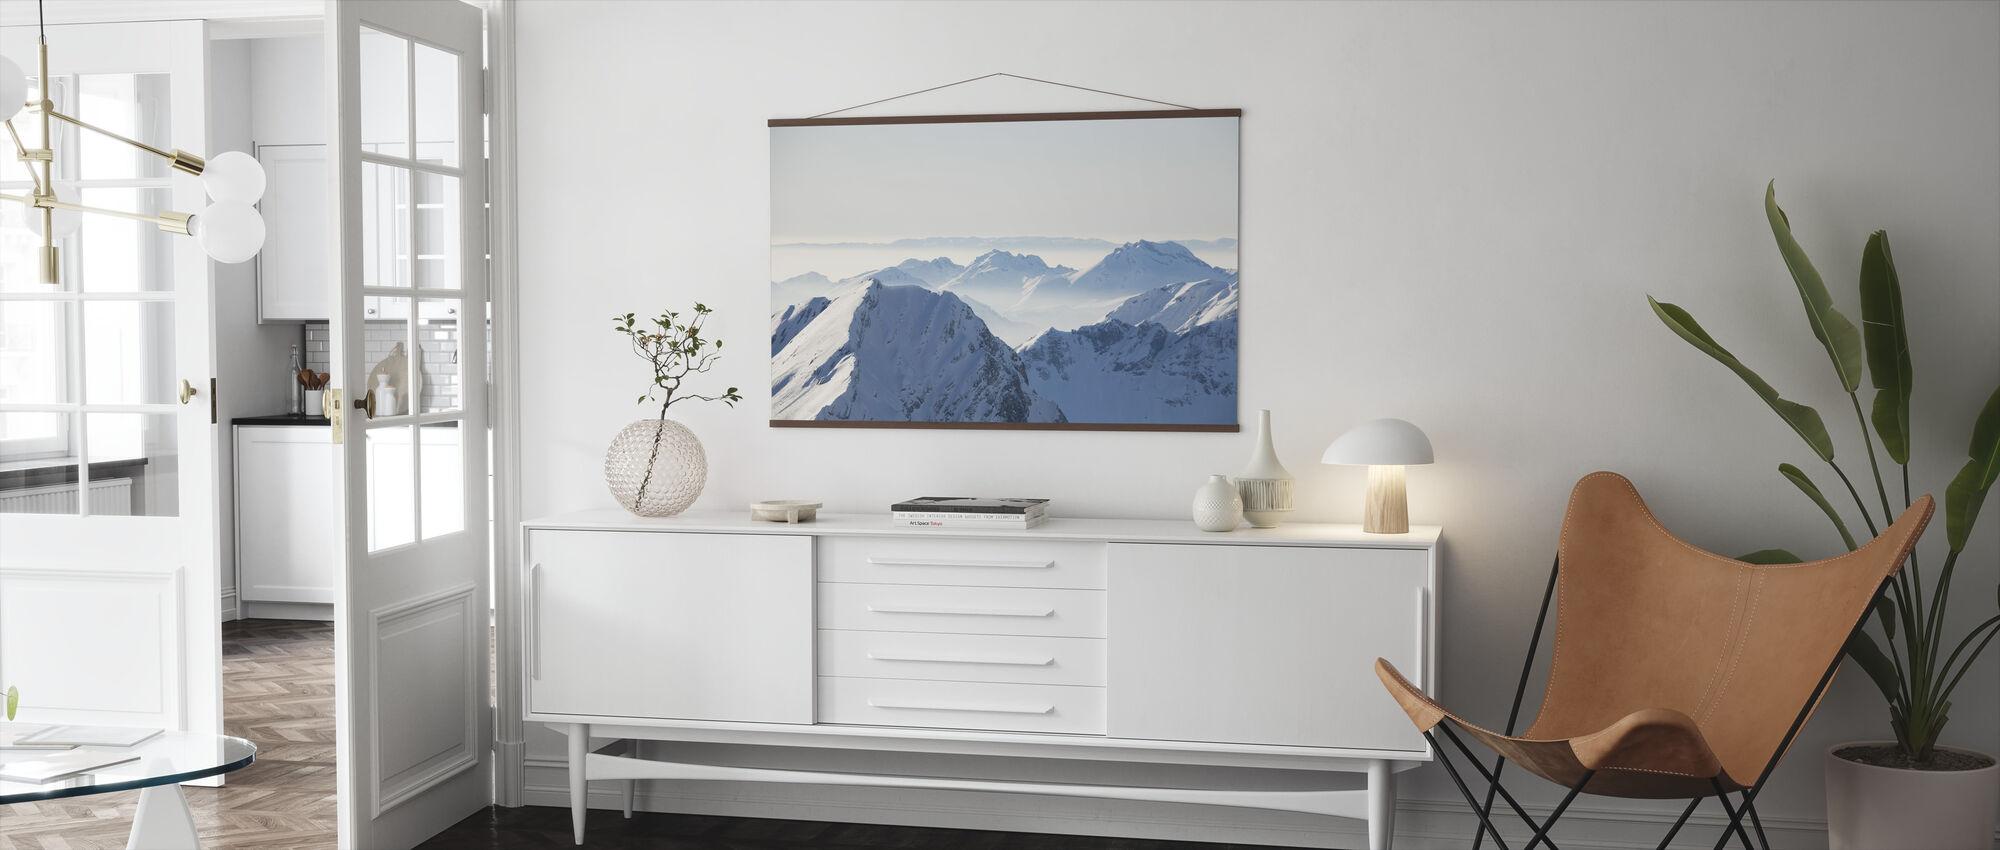 Chamonix Alps II, Frankrike - Poster - Vardagsrum